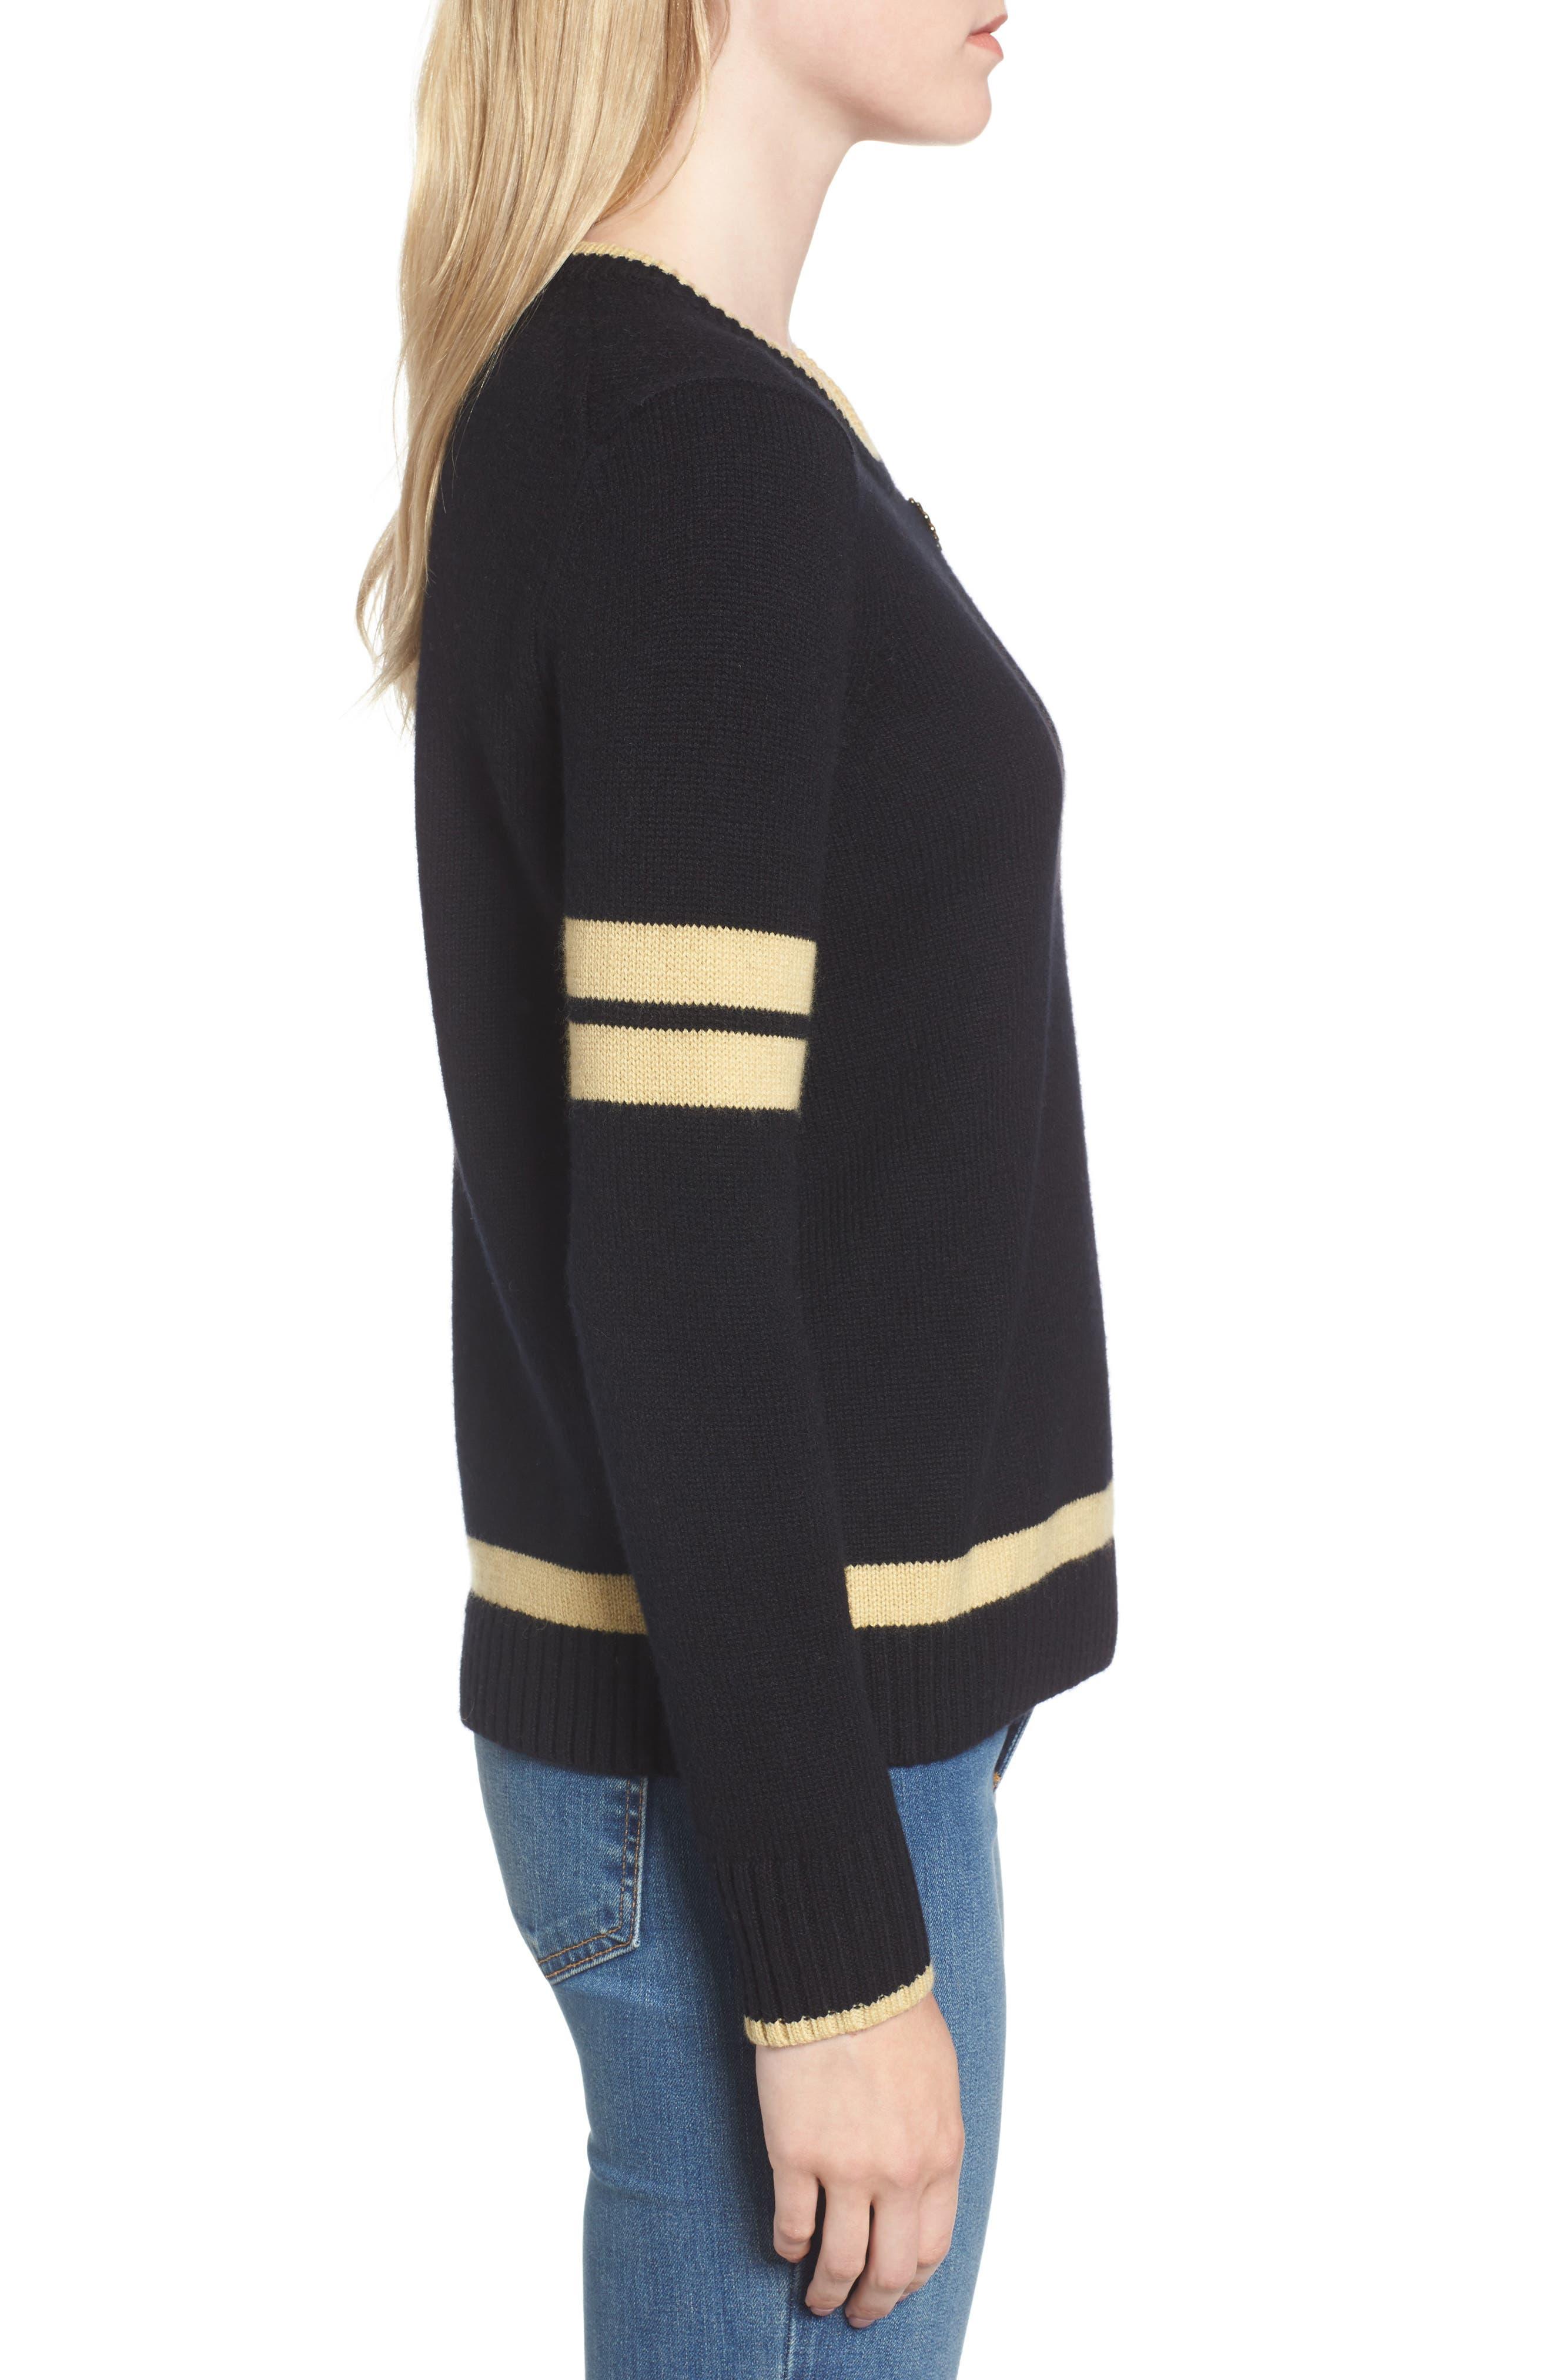 Spirit Sweater,                             Alternate thumbnail 3, color,                             Black/ Gold